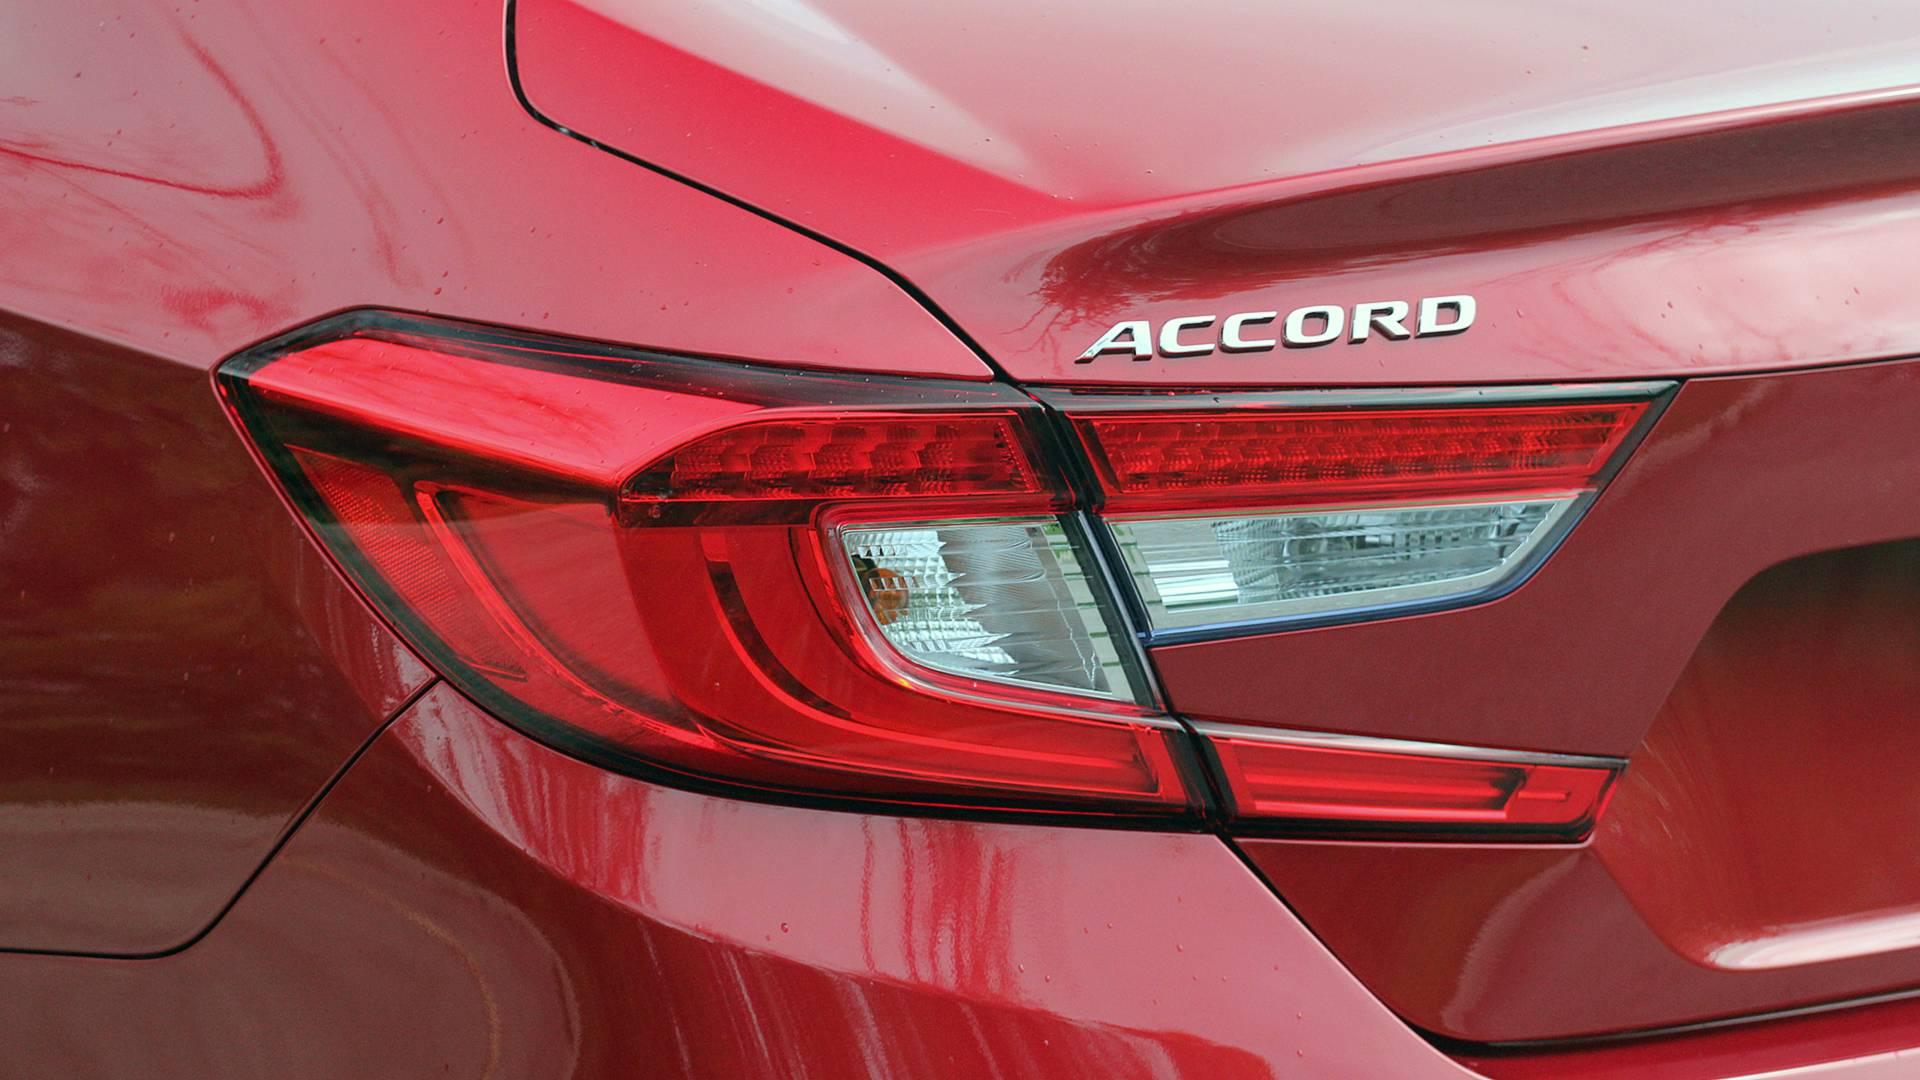 2018-honda-accord-hybrid-danh-gia-19.jpg